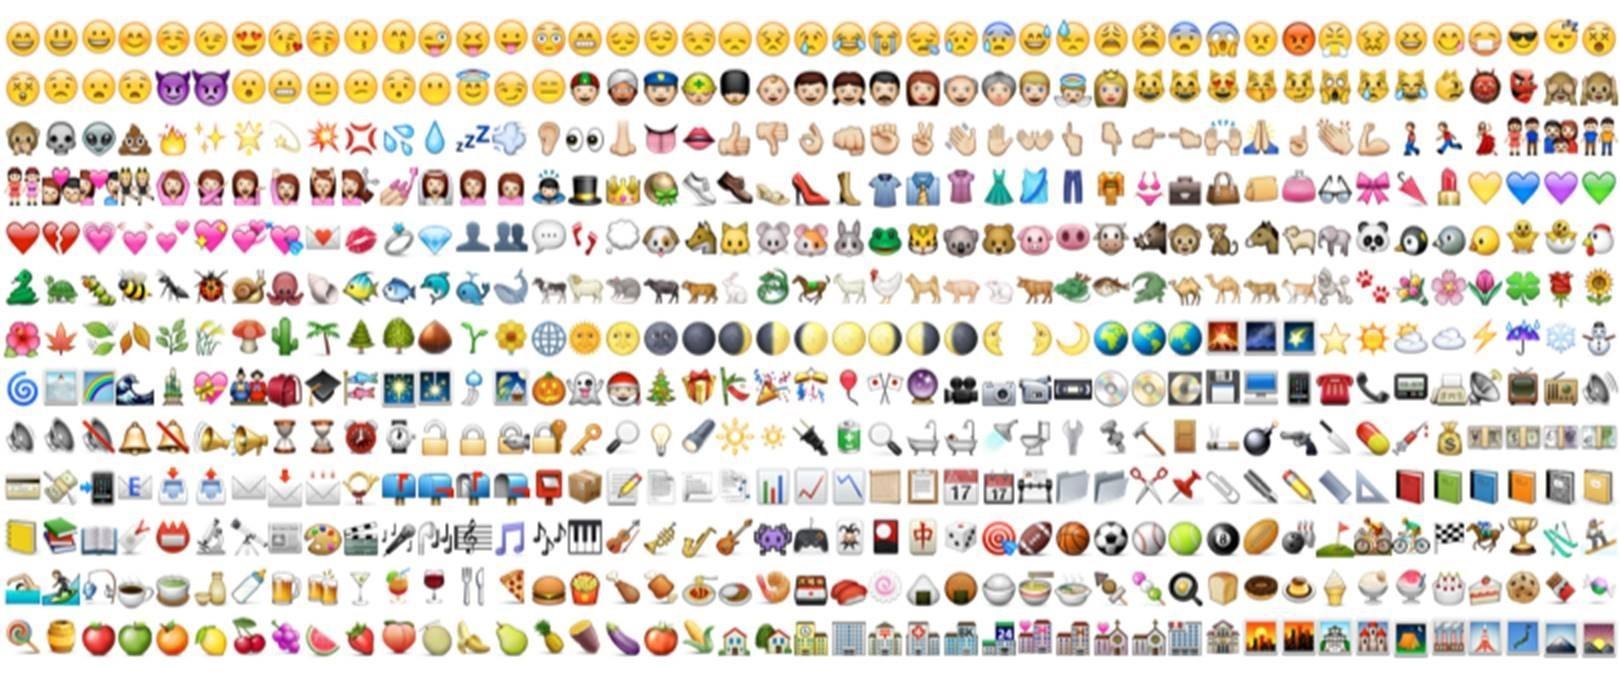 Using emojis in ad text boosts ctr wordstream emojis in ad text emoji list biocorpaavc Images